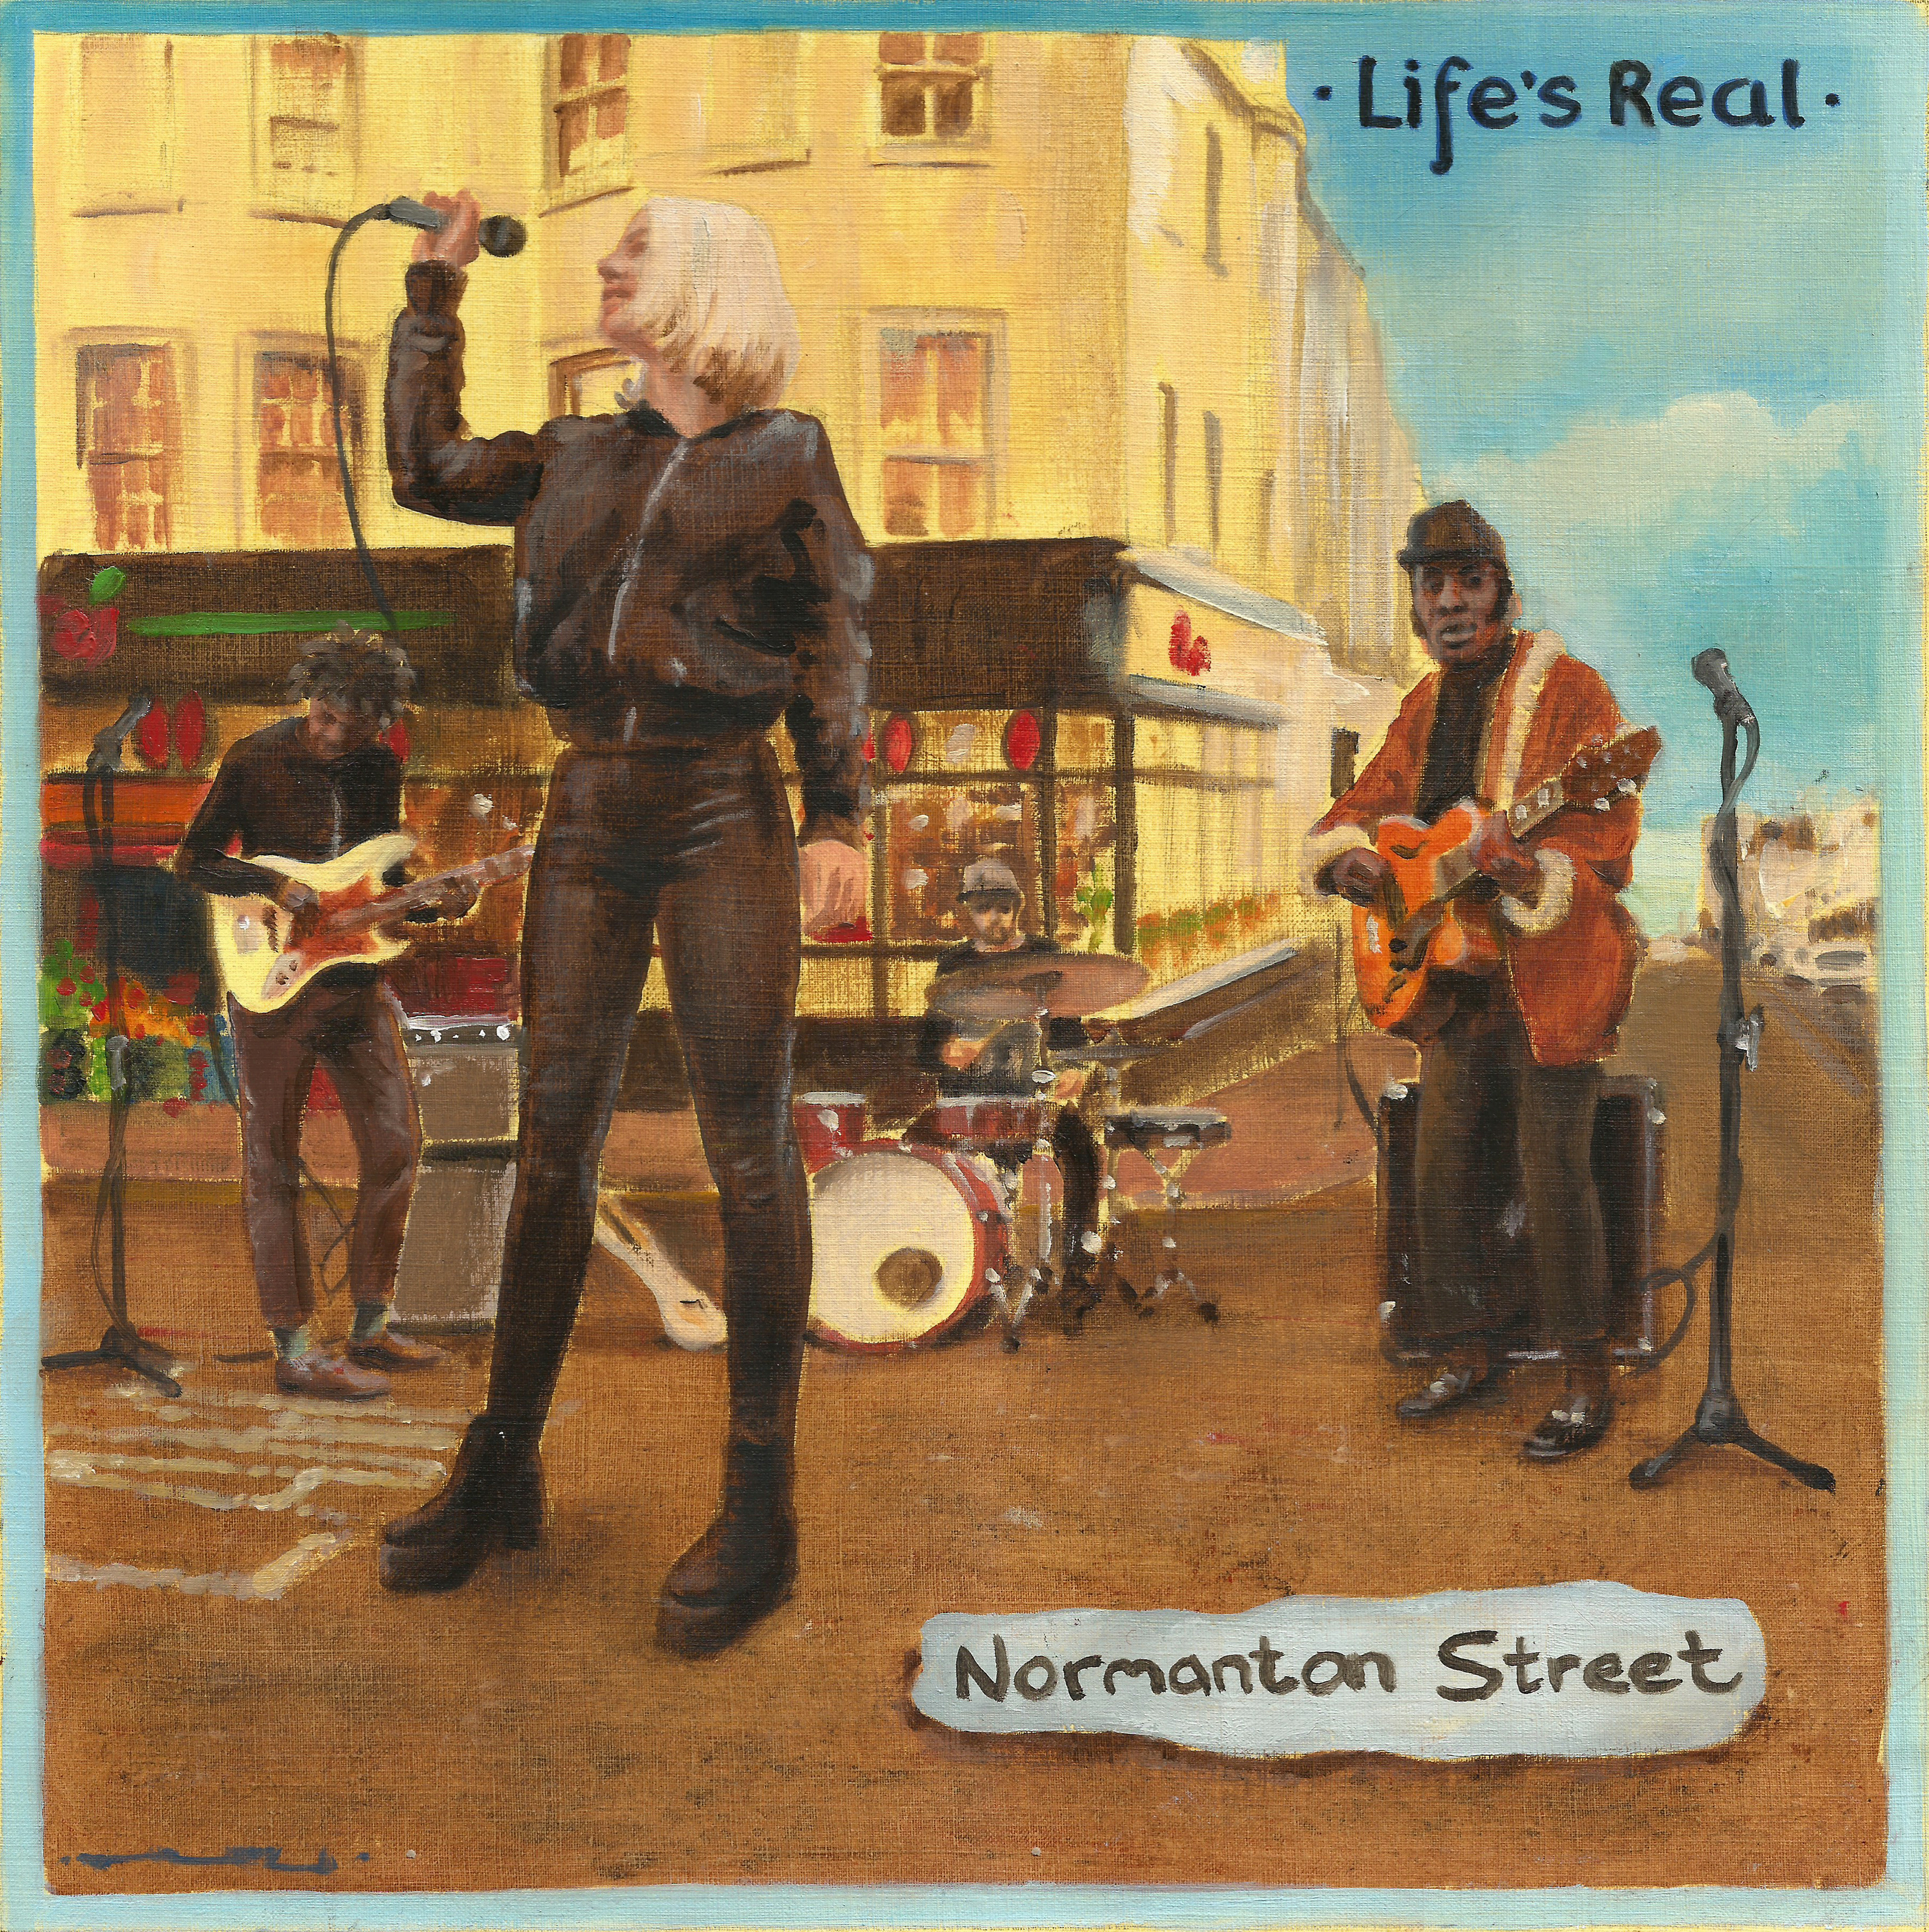 Normanton Street